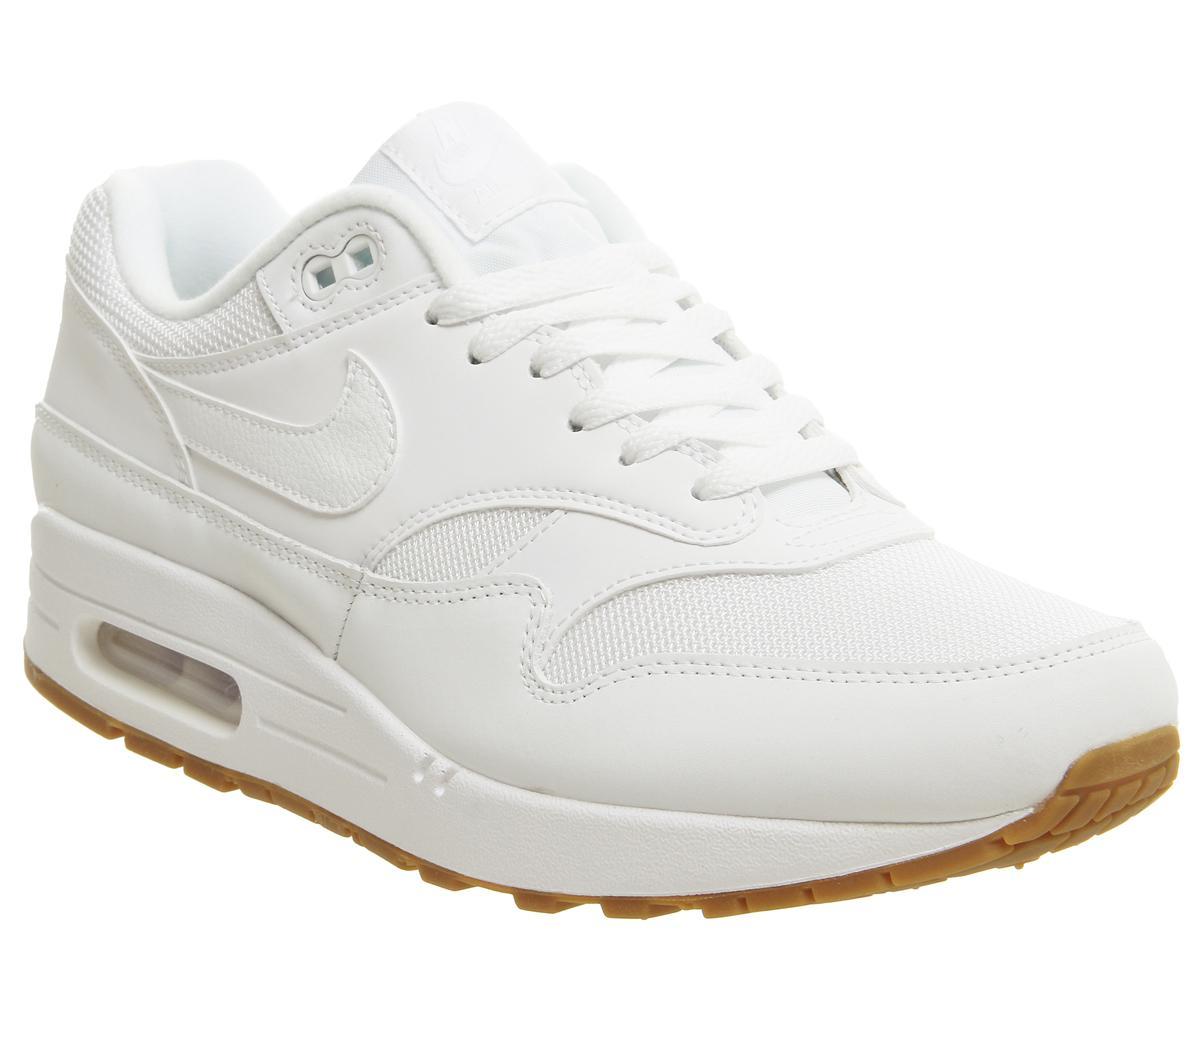 Alternativa tuberculosis Derechos de autor  Nike Air Max 1 Trainers White White Gum Medium Brown - His trainers